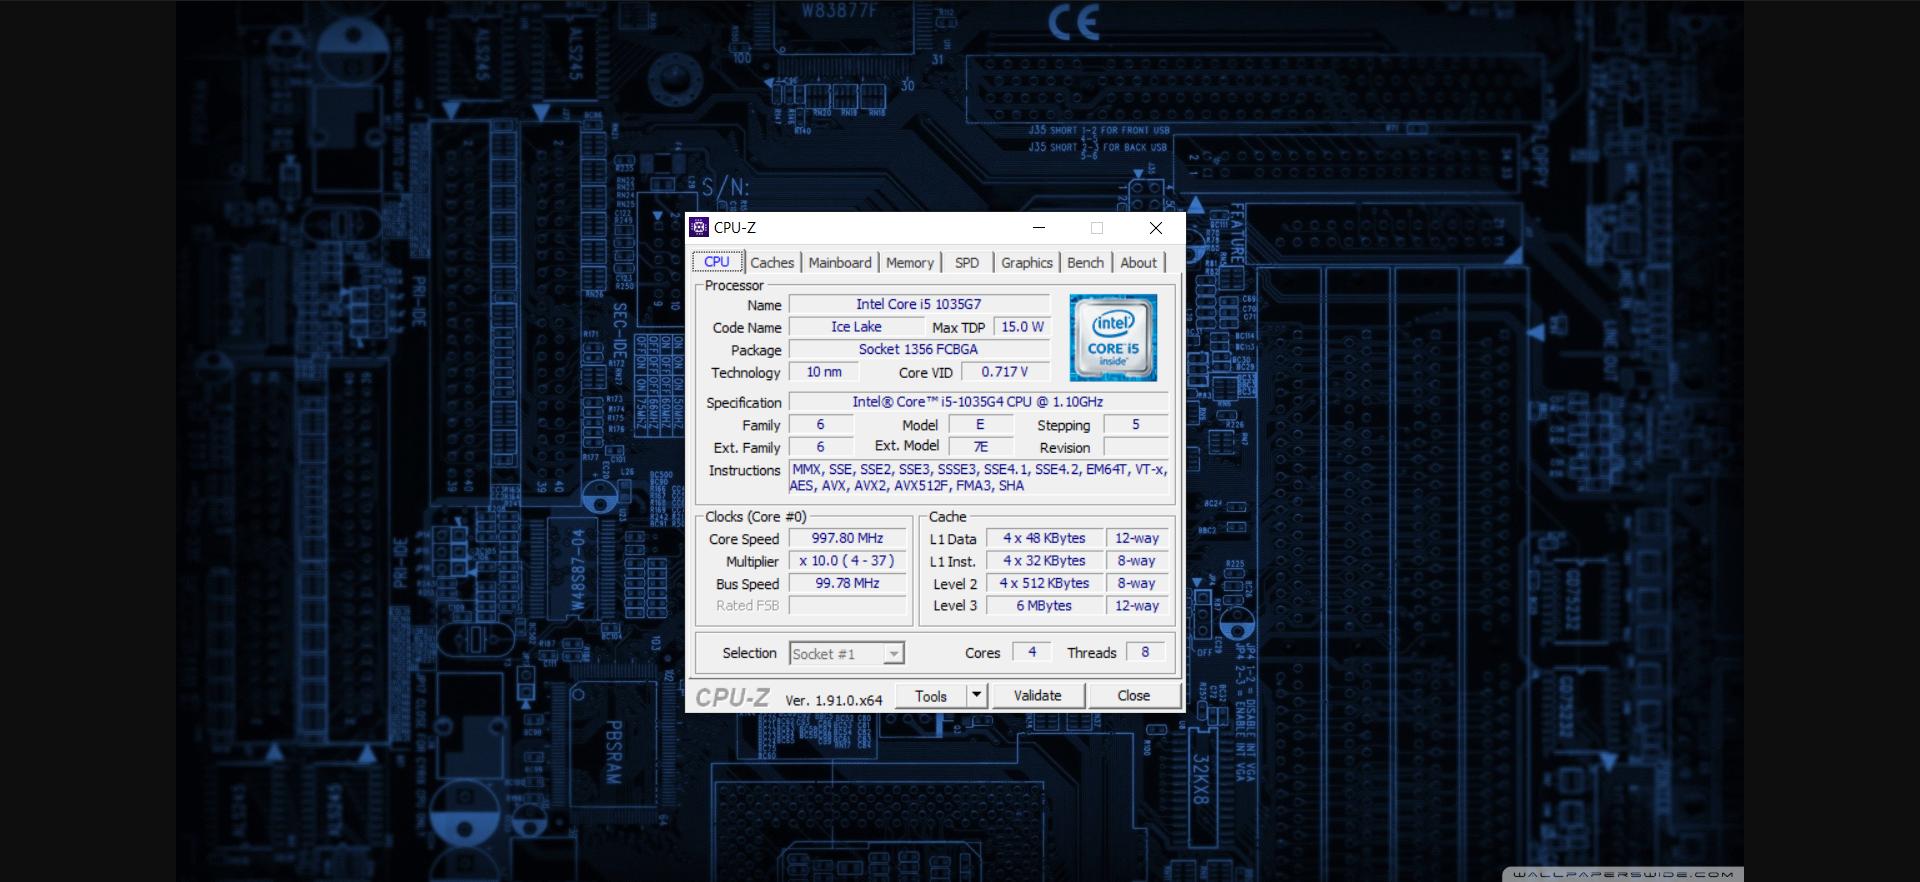 Download CPU-Z (32 bit - 64 bit)